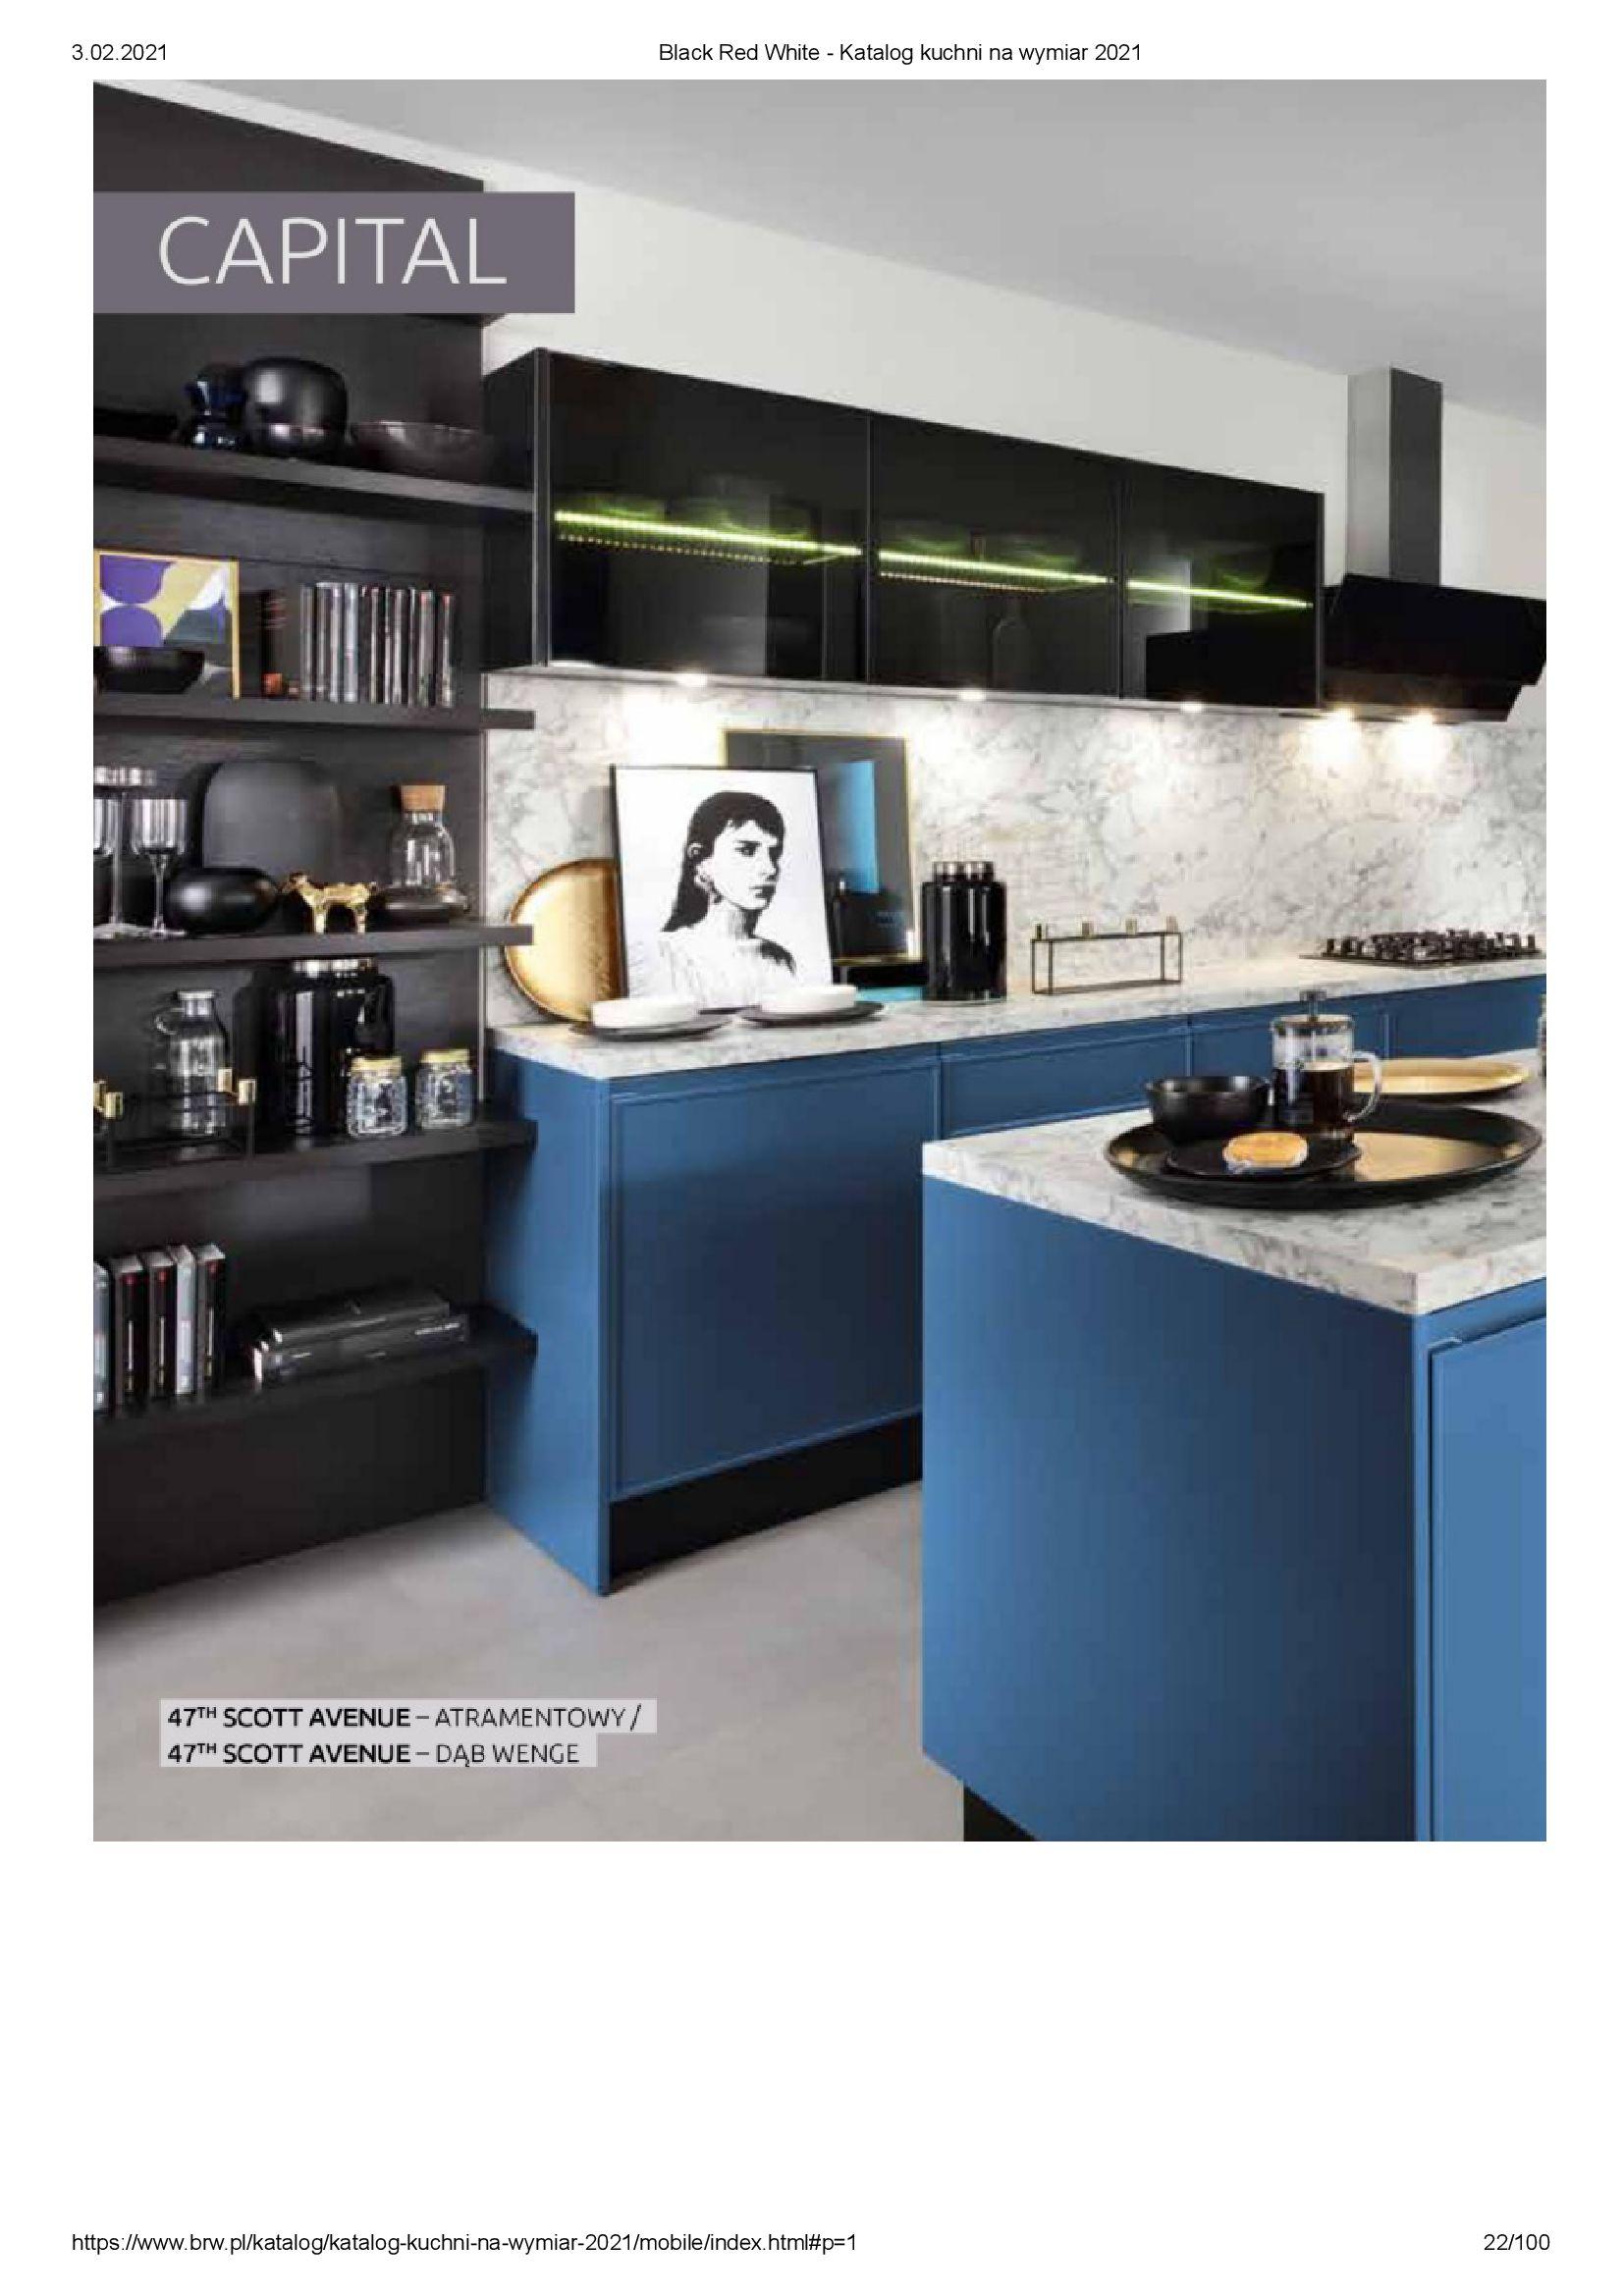 Gazetka Black Red White: Katalog - Kuchnie na wymiar Senso Kitchens 2021 2021-01-01 page-22